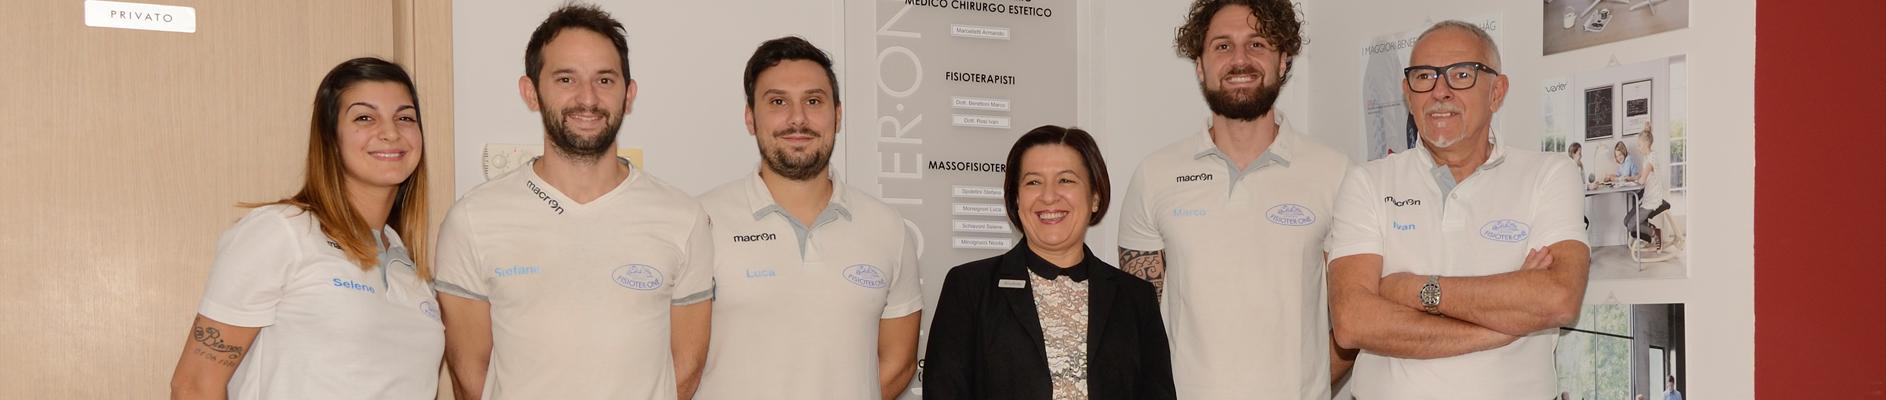 Fisioterapia Perugia